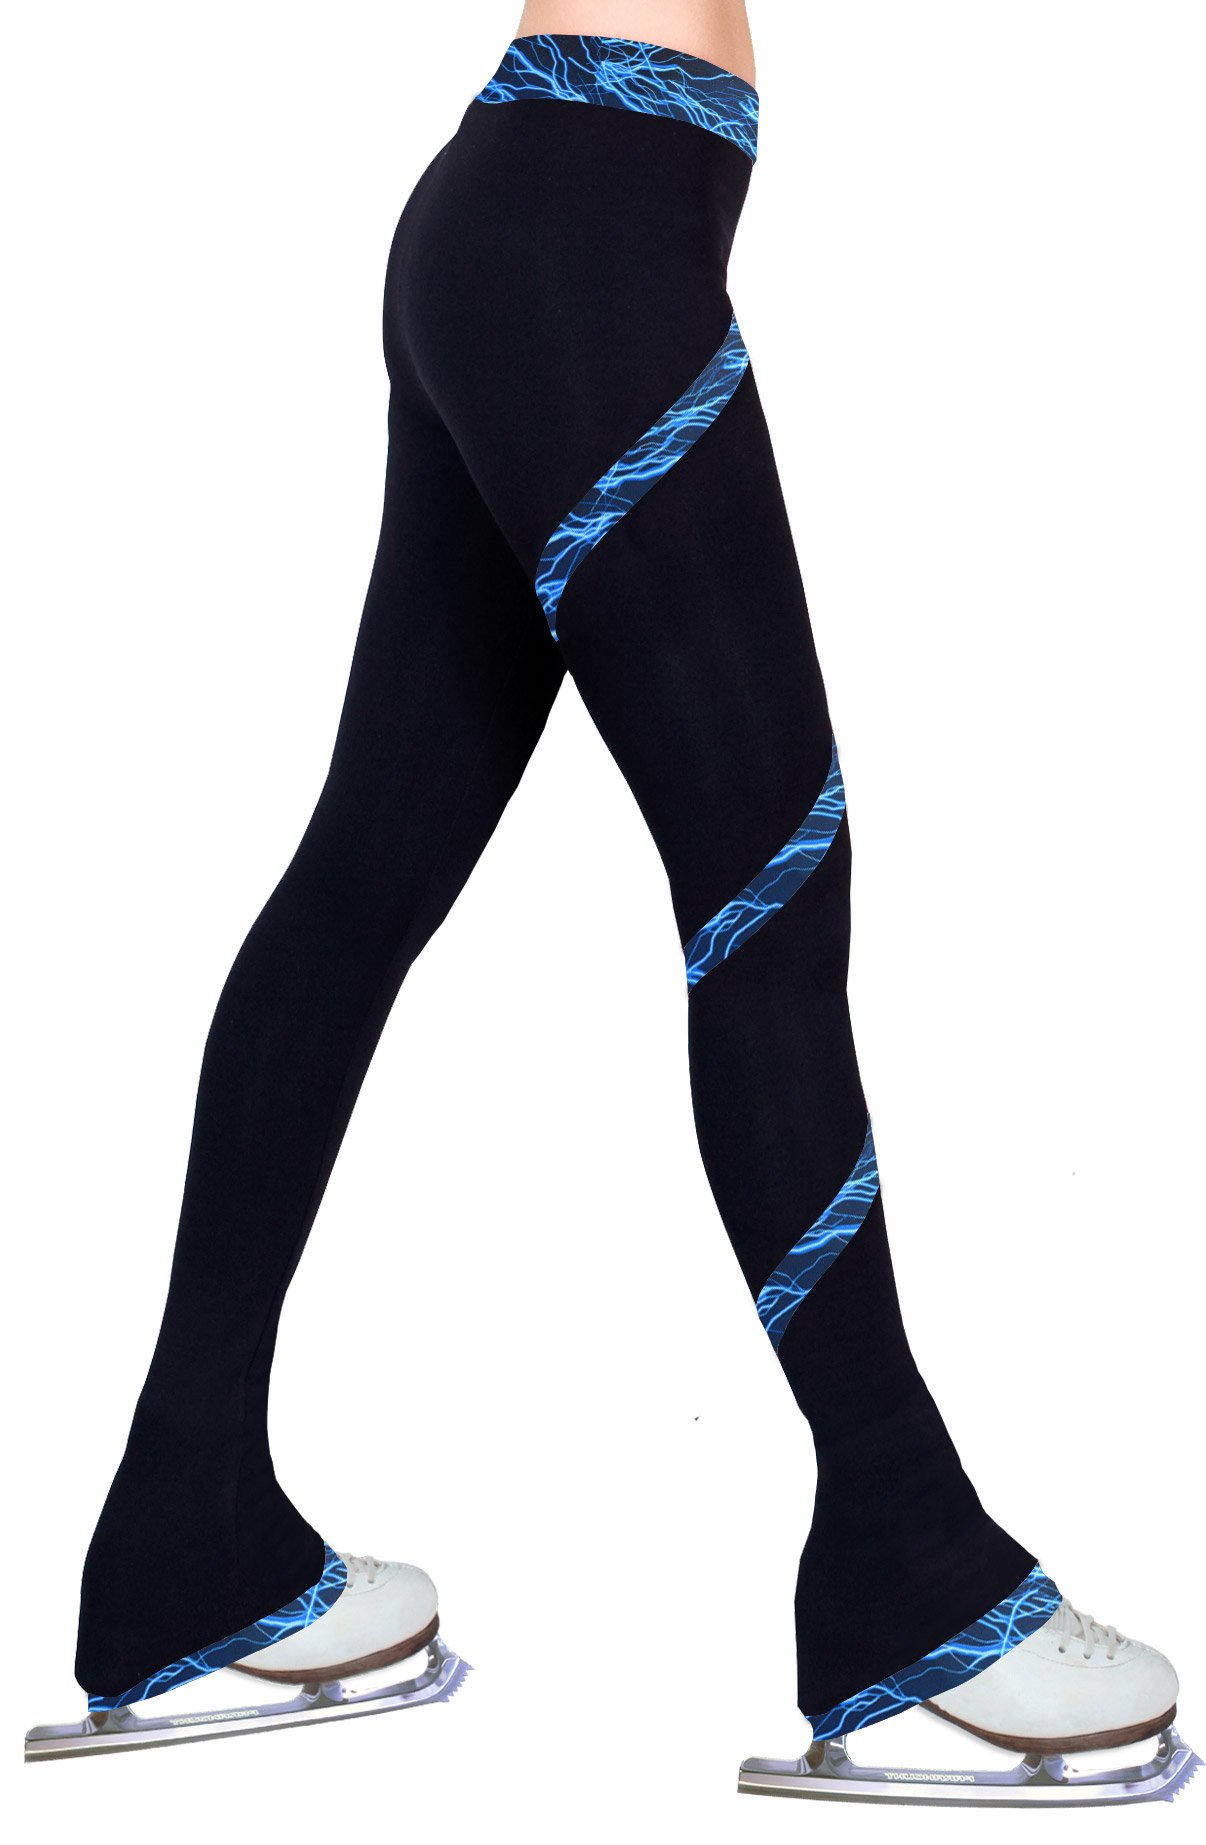 ny2 Sportswear Figure Skating Spiral Polartec Polar Fleece Pants (Lighting Foil Blue, Child Extra Small) by ny2 Sportswear